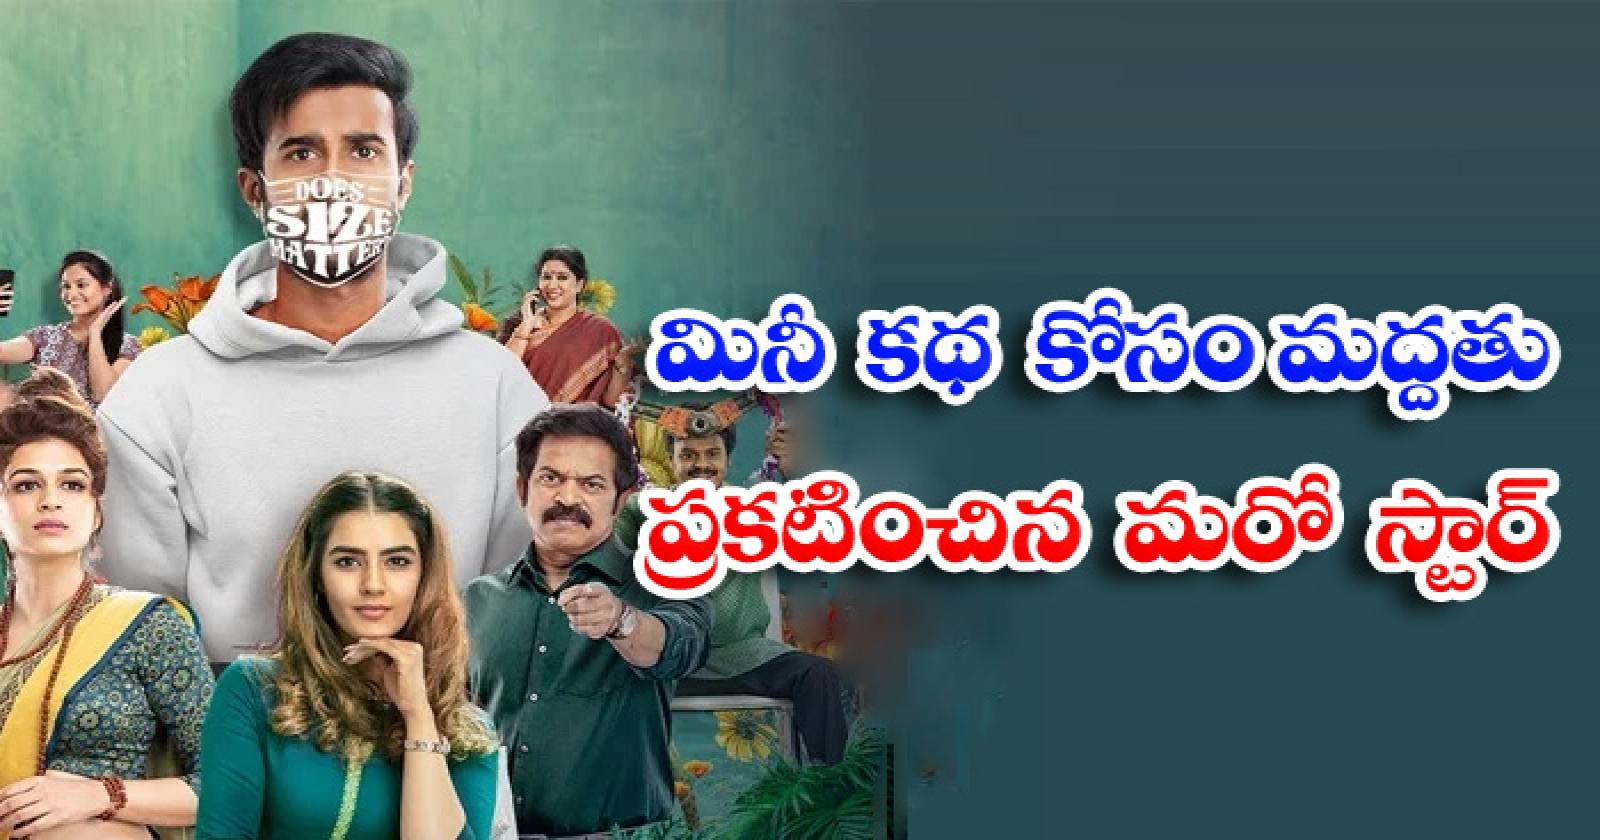 Santhosh Sobhan Movie Ek Mini Katha Sarvanand Comments-మినీ కథ కోసం మద్దతు ప్రకటించిన మరో స్టార్-Latest News - Telugu-Telugu Tollywood Photo Image-TeluguStop.com